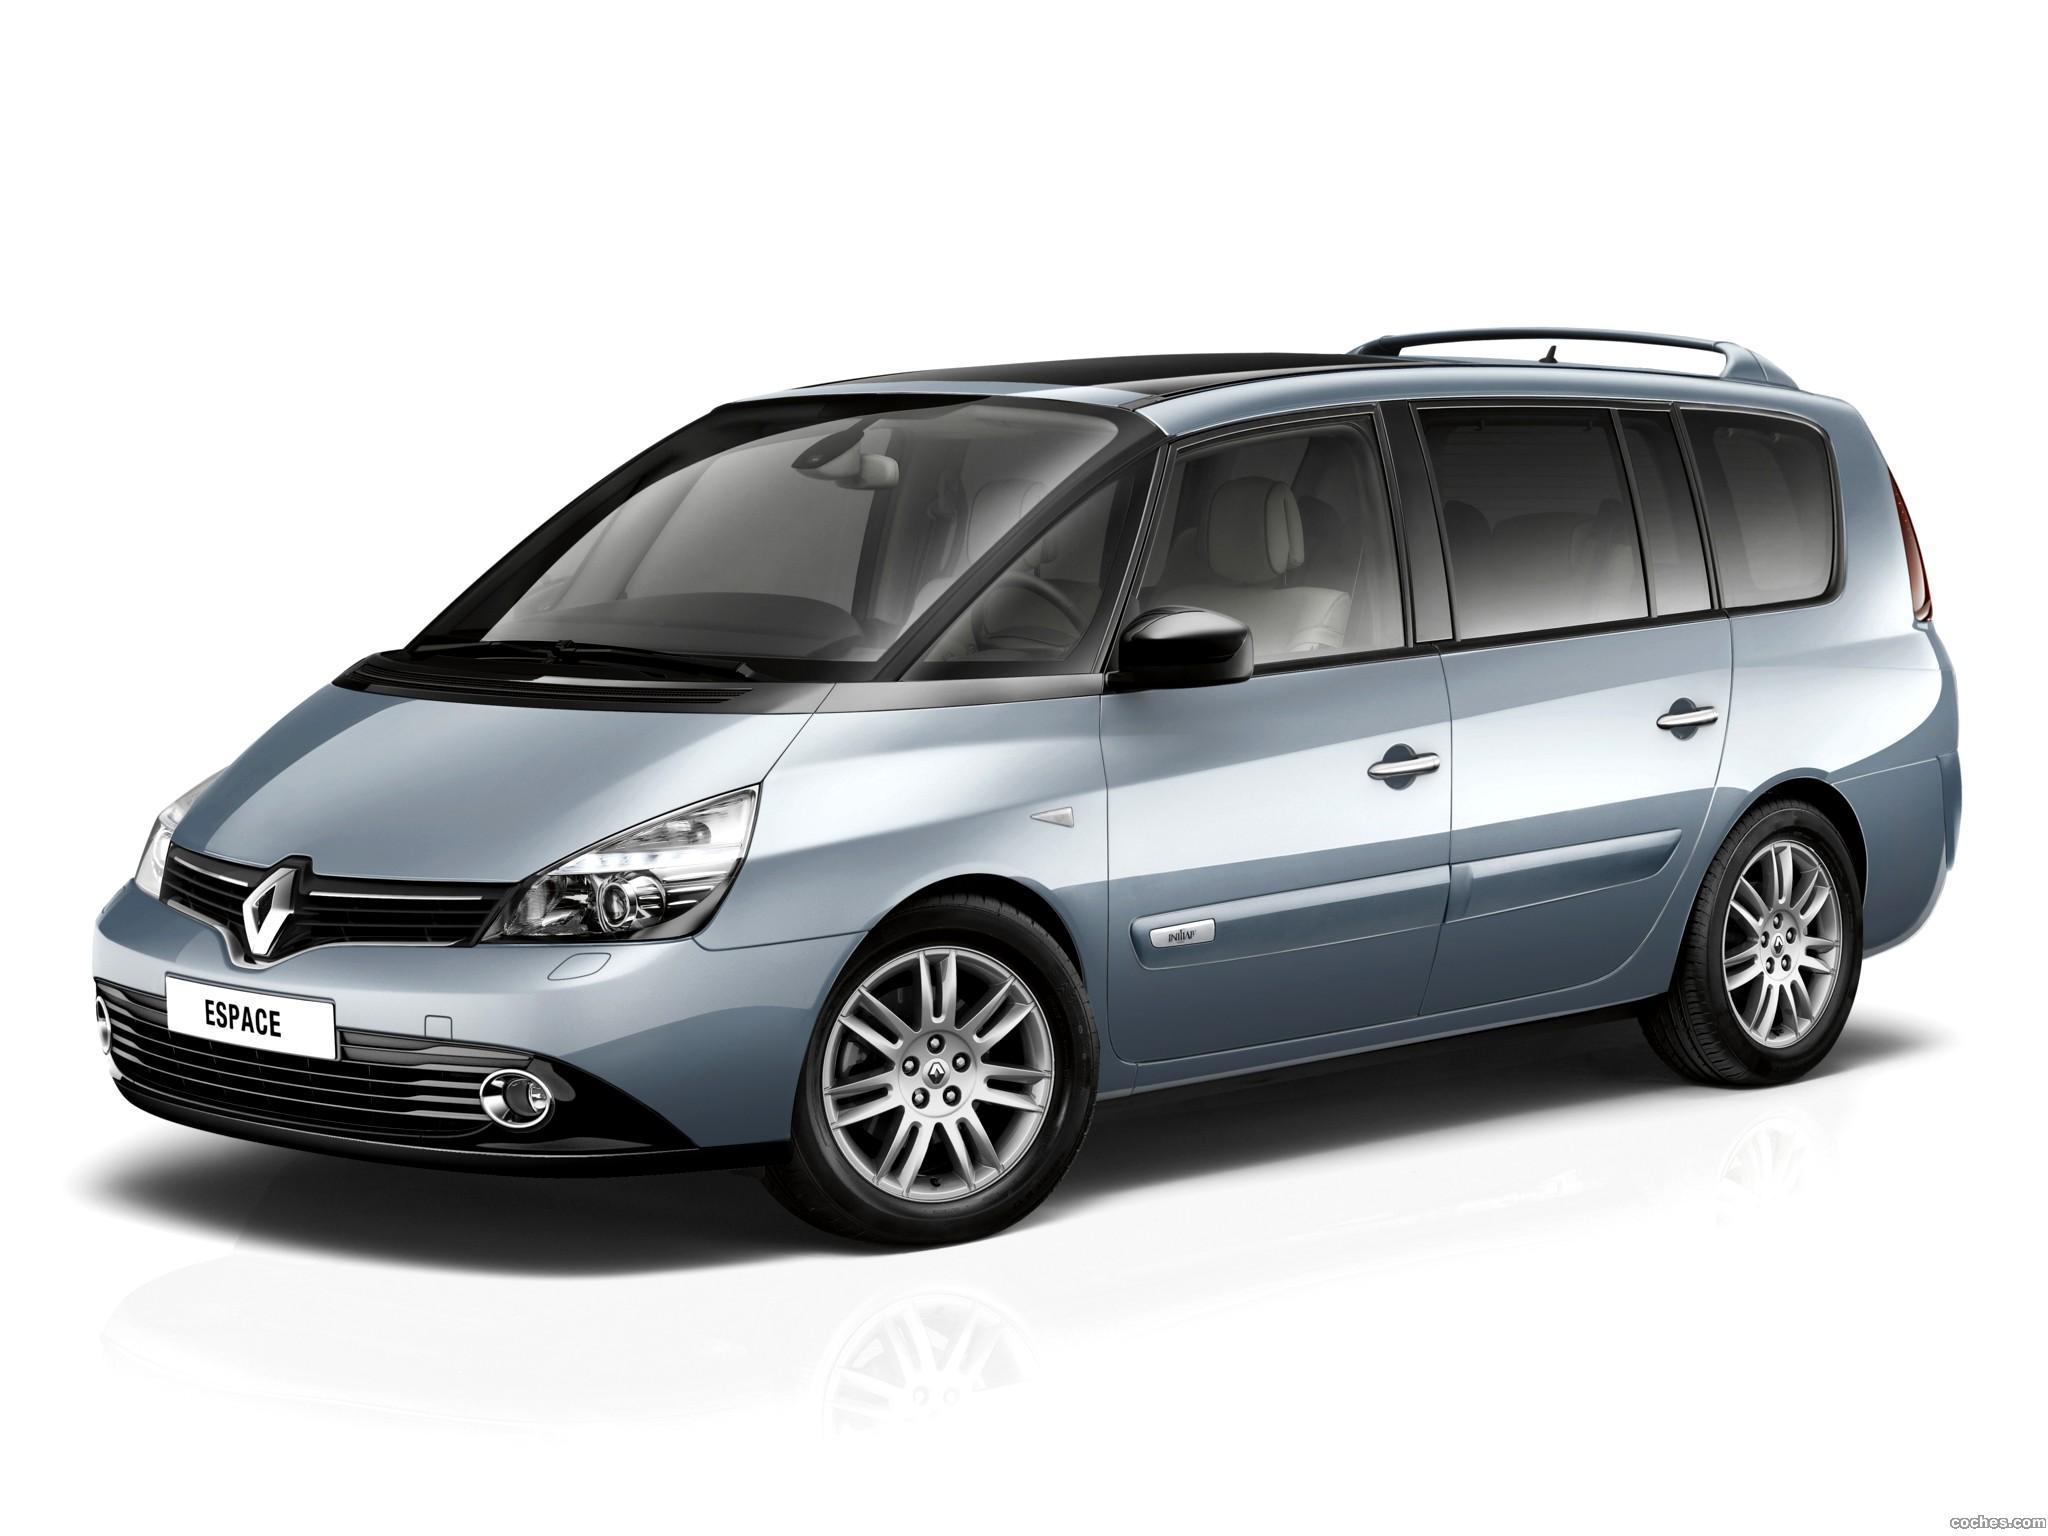 Foto 0 de Renault Grand Espace 2012